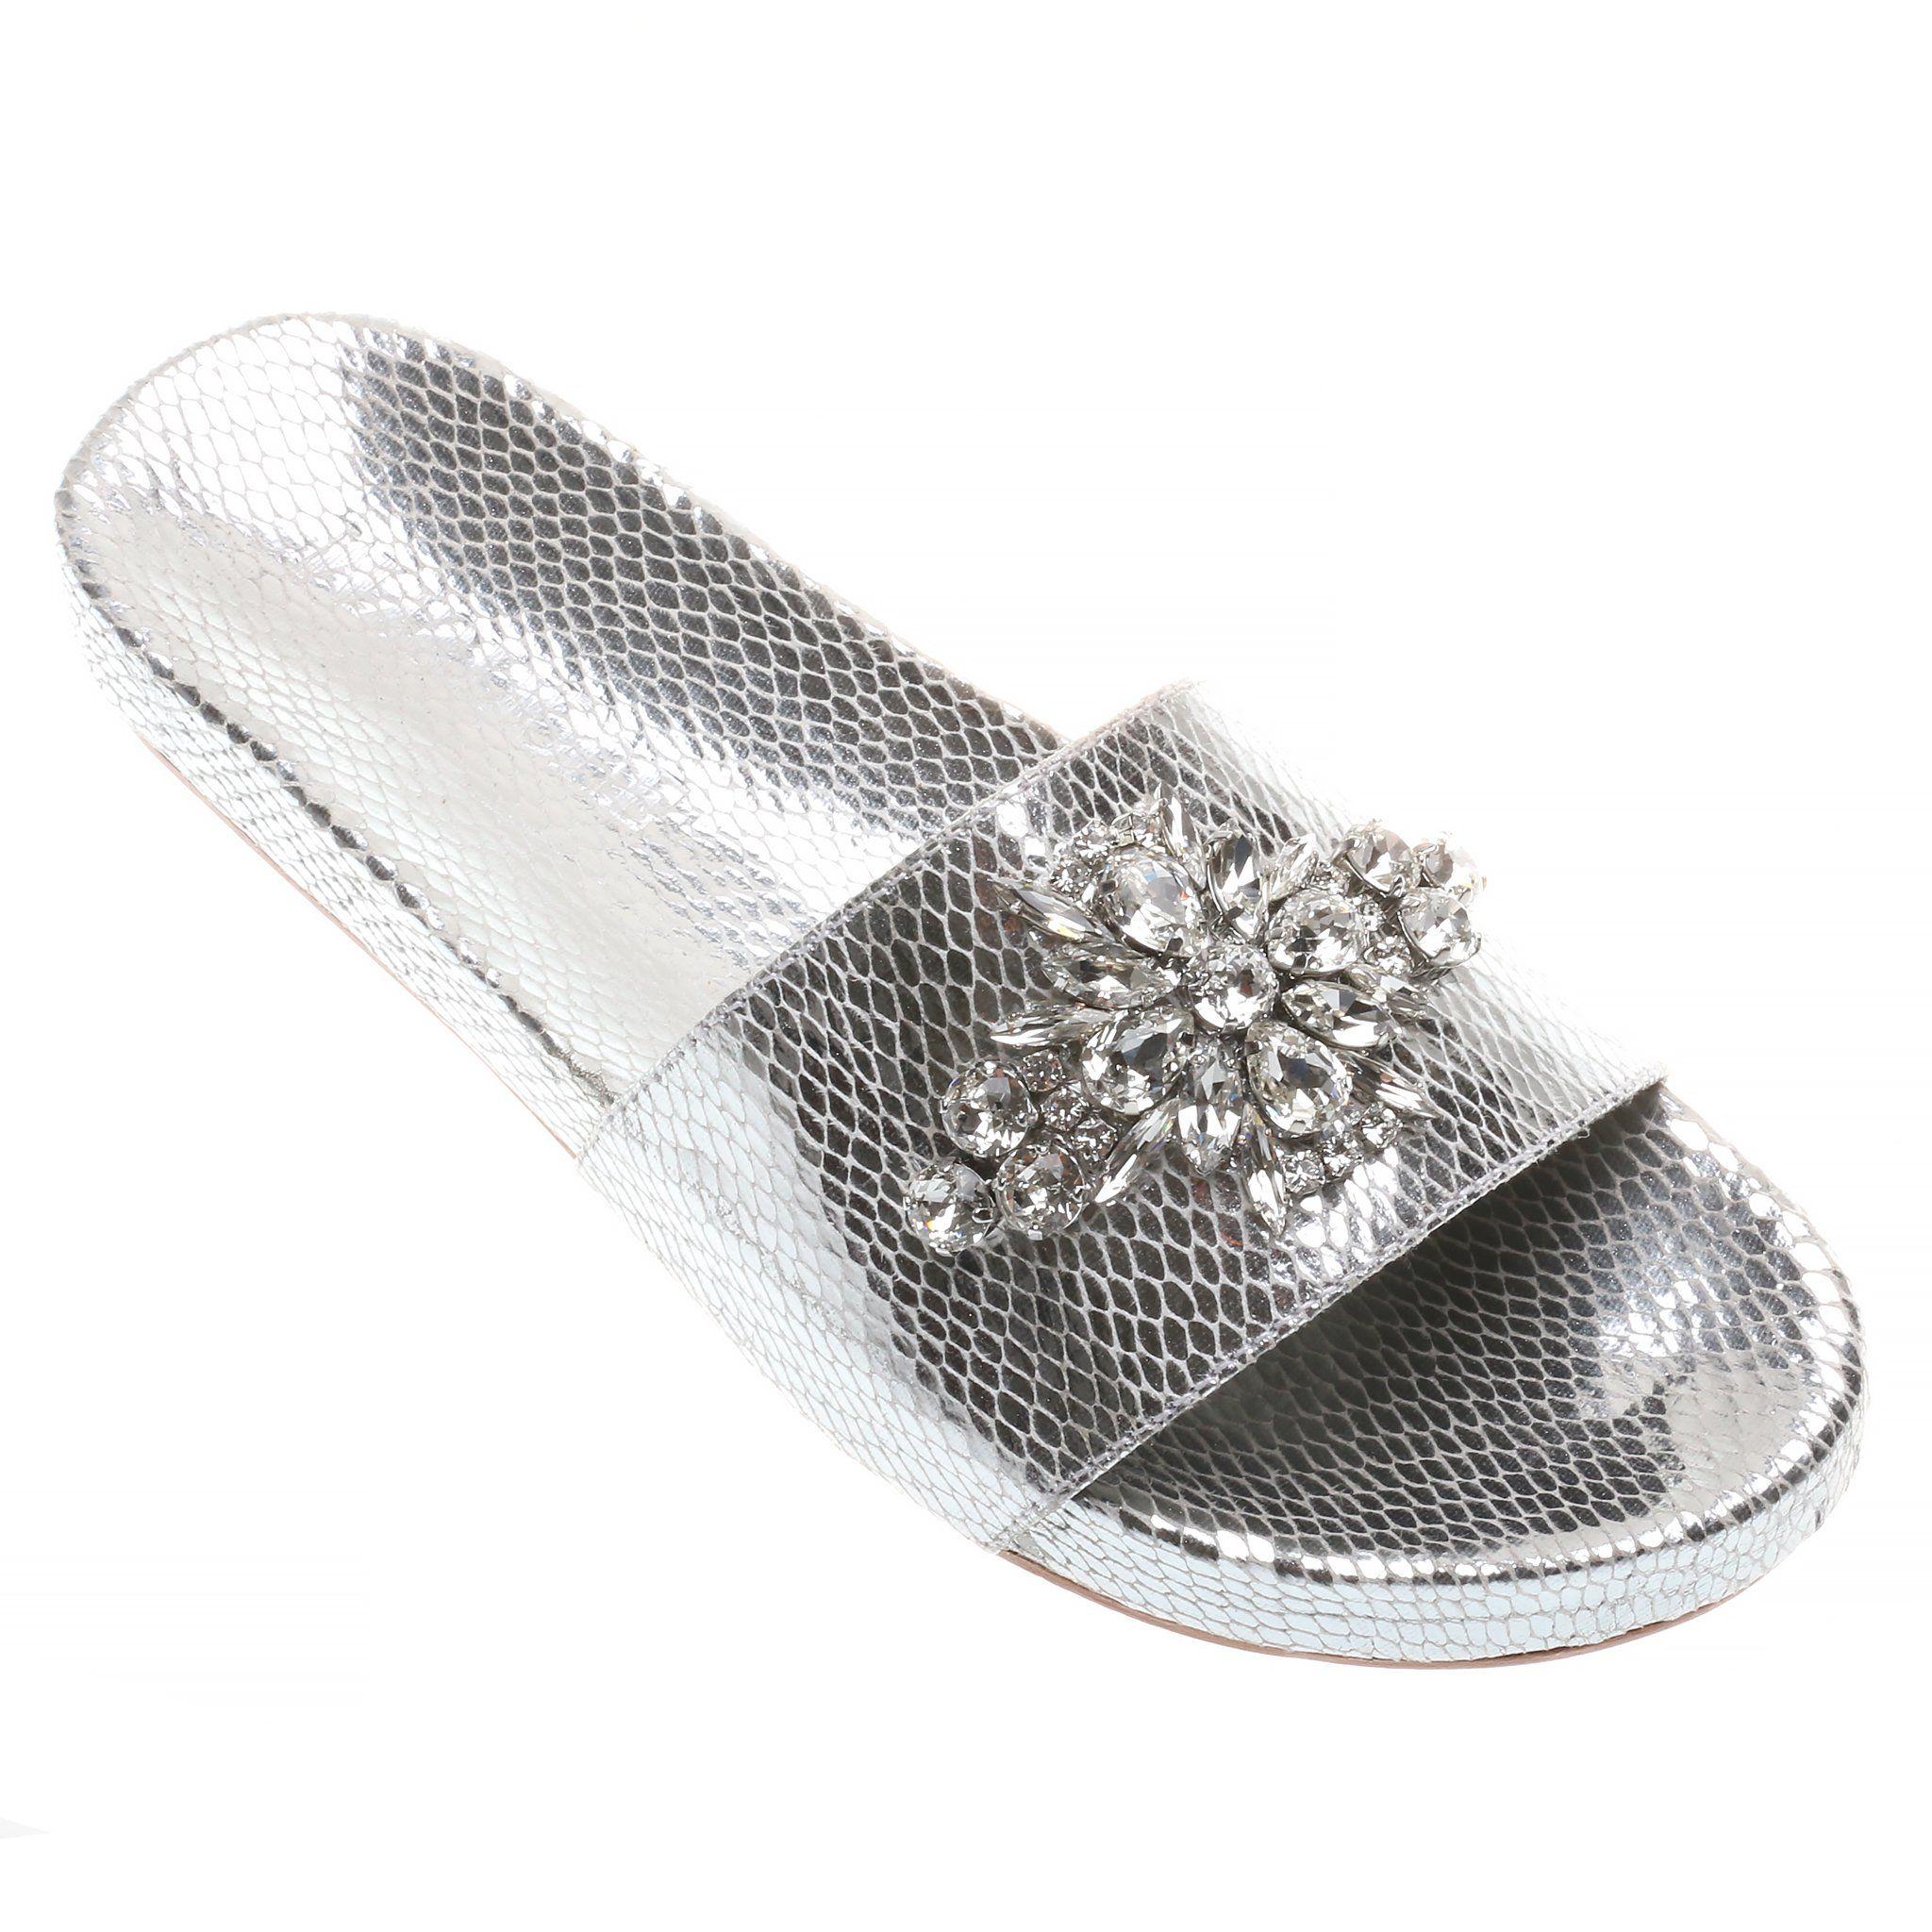 299c3bc08 Mauritius - Women s Silver Pool Slide Gem Sandals